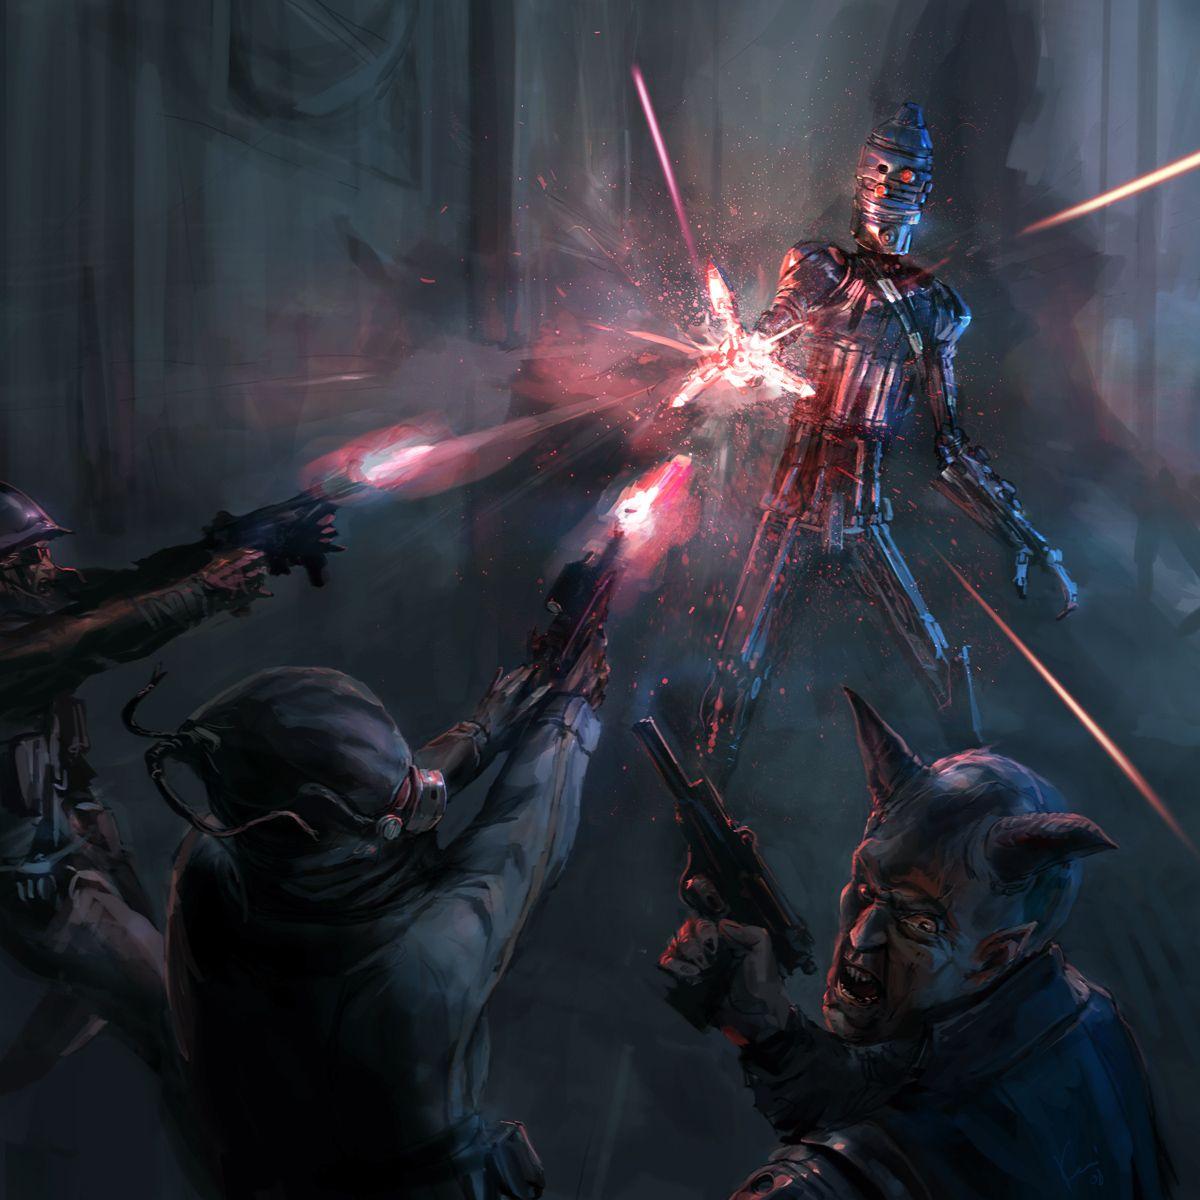 Swgtcg Blaster Reflective By Ukitakumuki Star Wars Art Star Wars Fan Art Star Wars Wallpaper